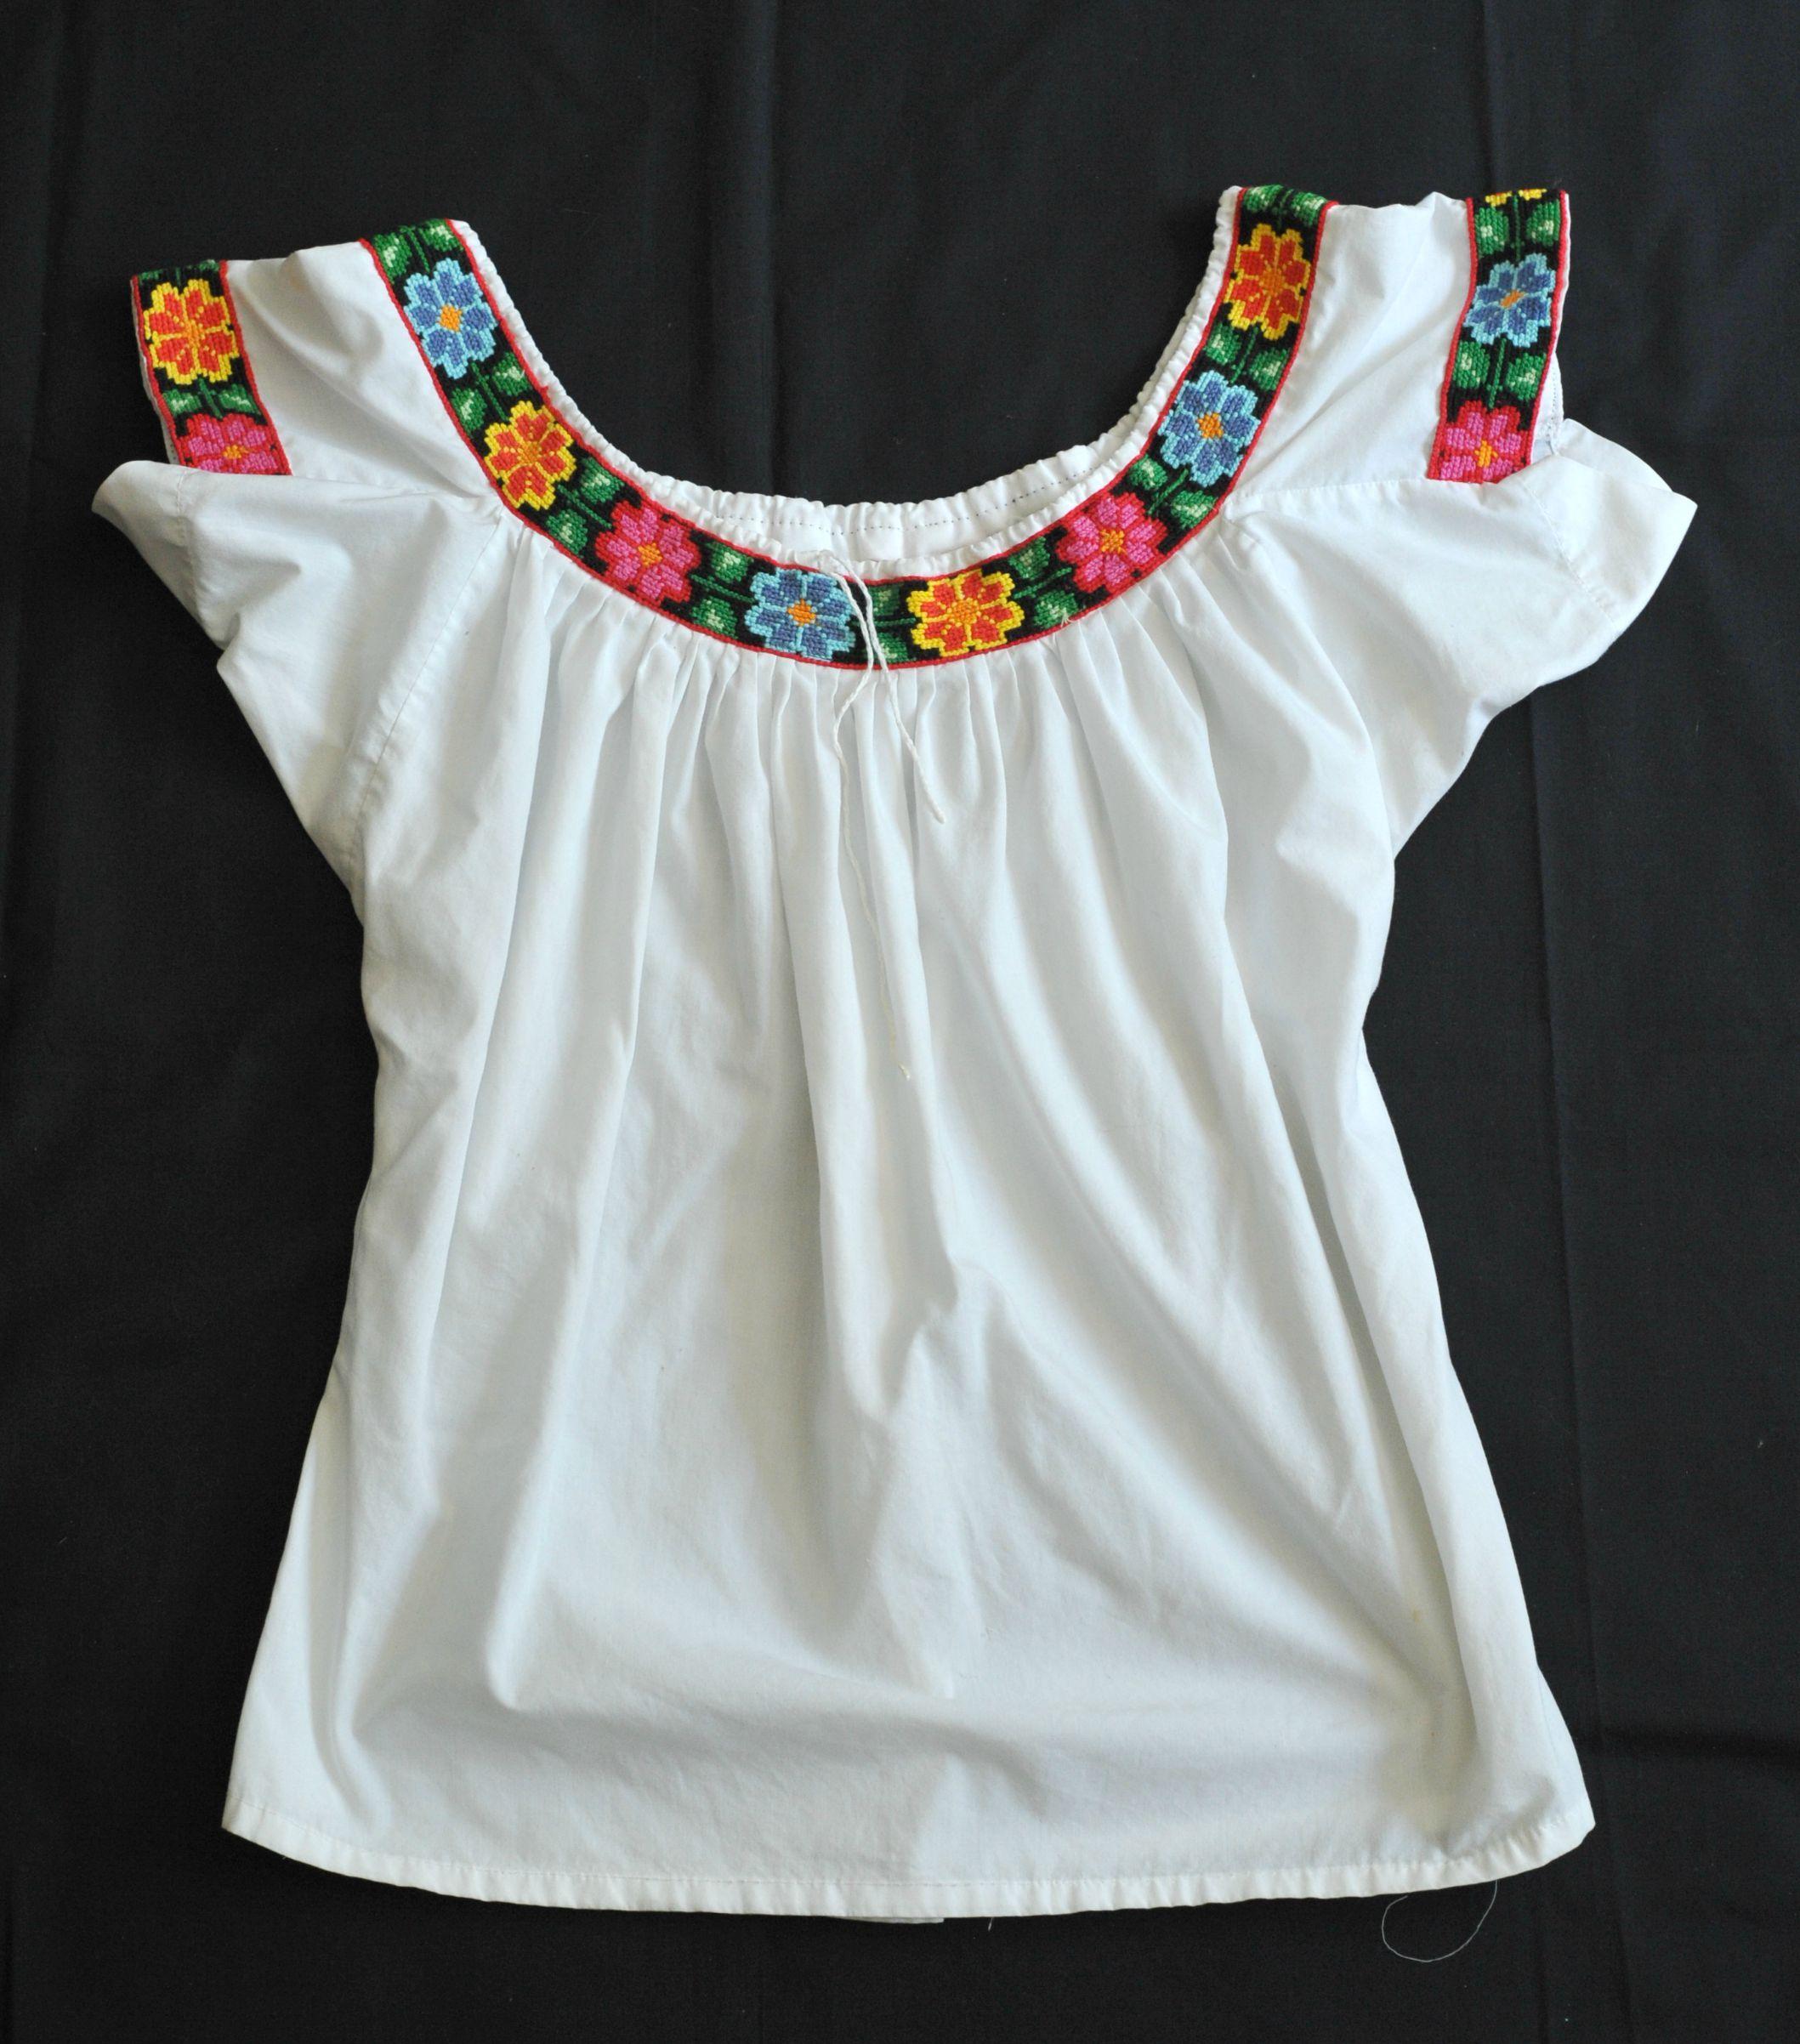 blackmagic   belleza   Pinterest   Bordado, Blusa bordada y Ropa